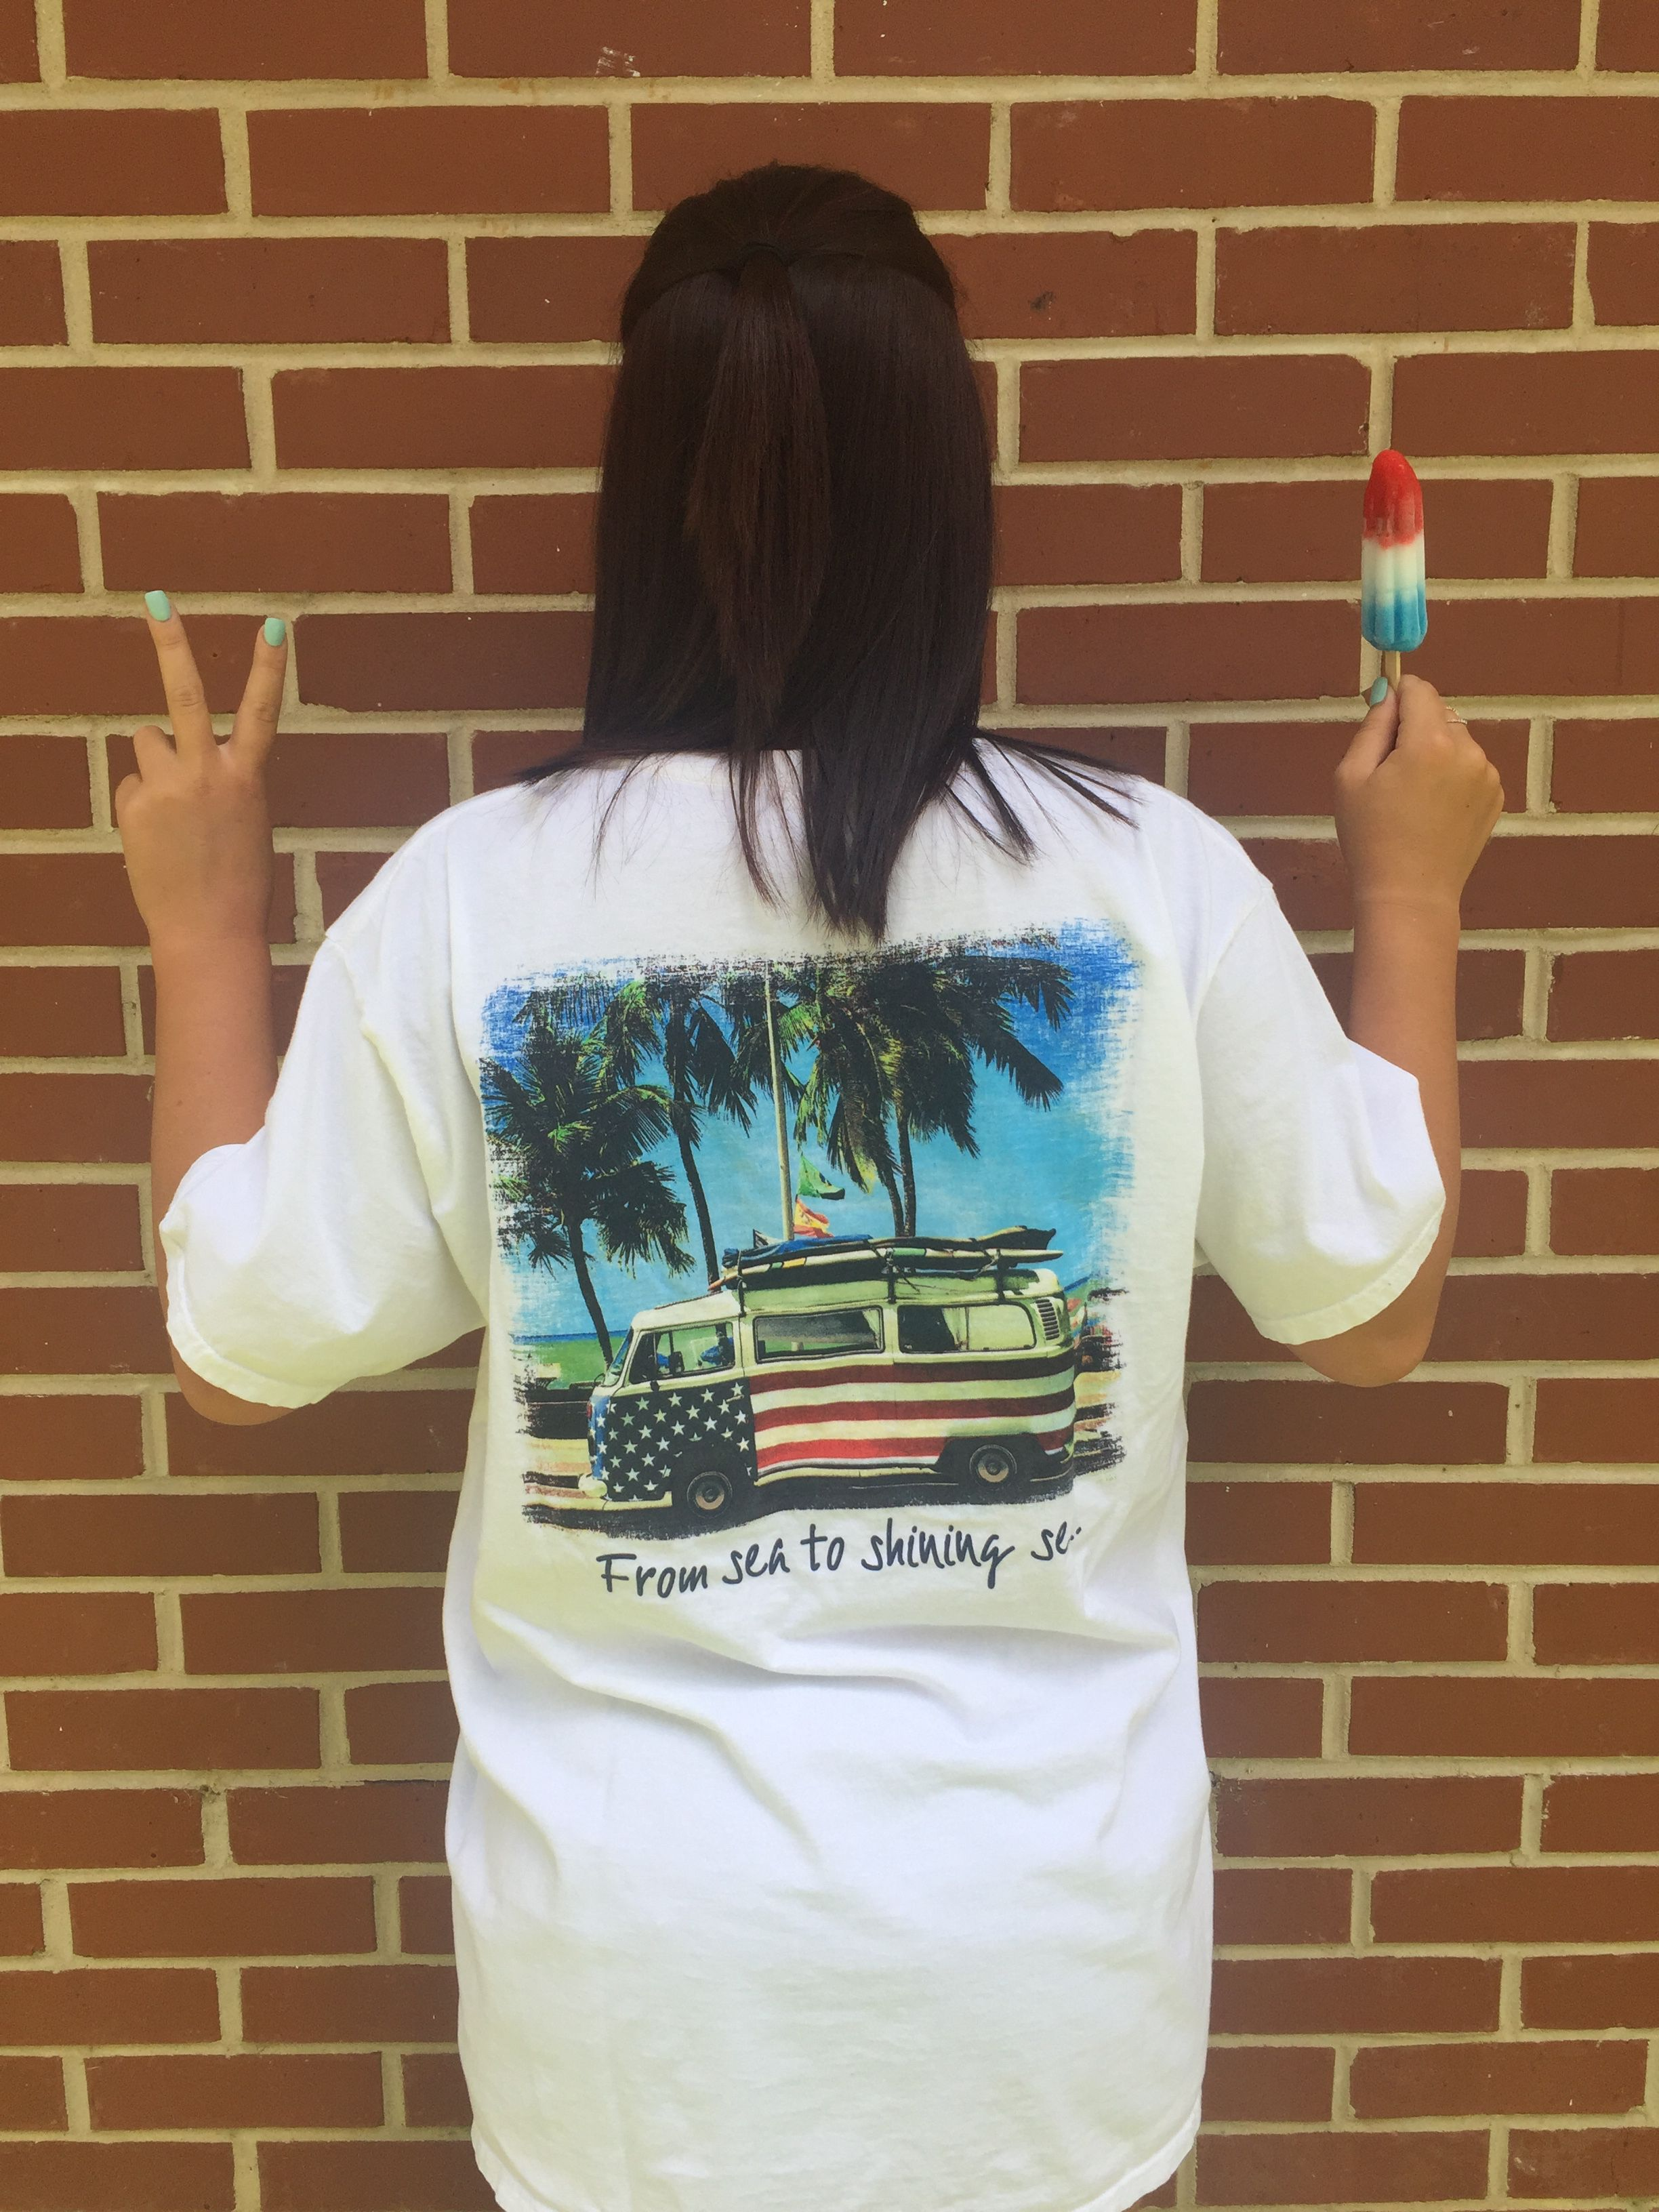 Shirt design jacksonville fl - From Sea To Shining Sea Ken Young Co Shirt Design Tshirt